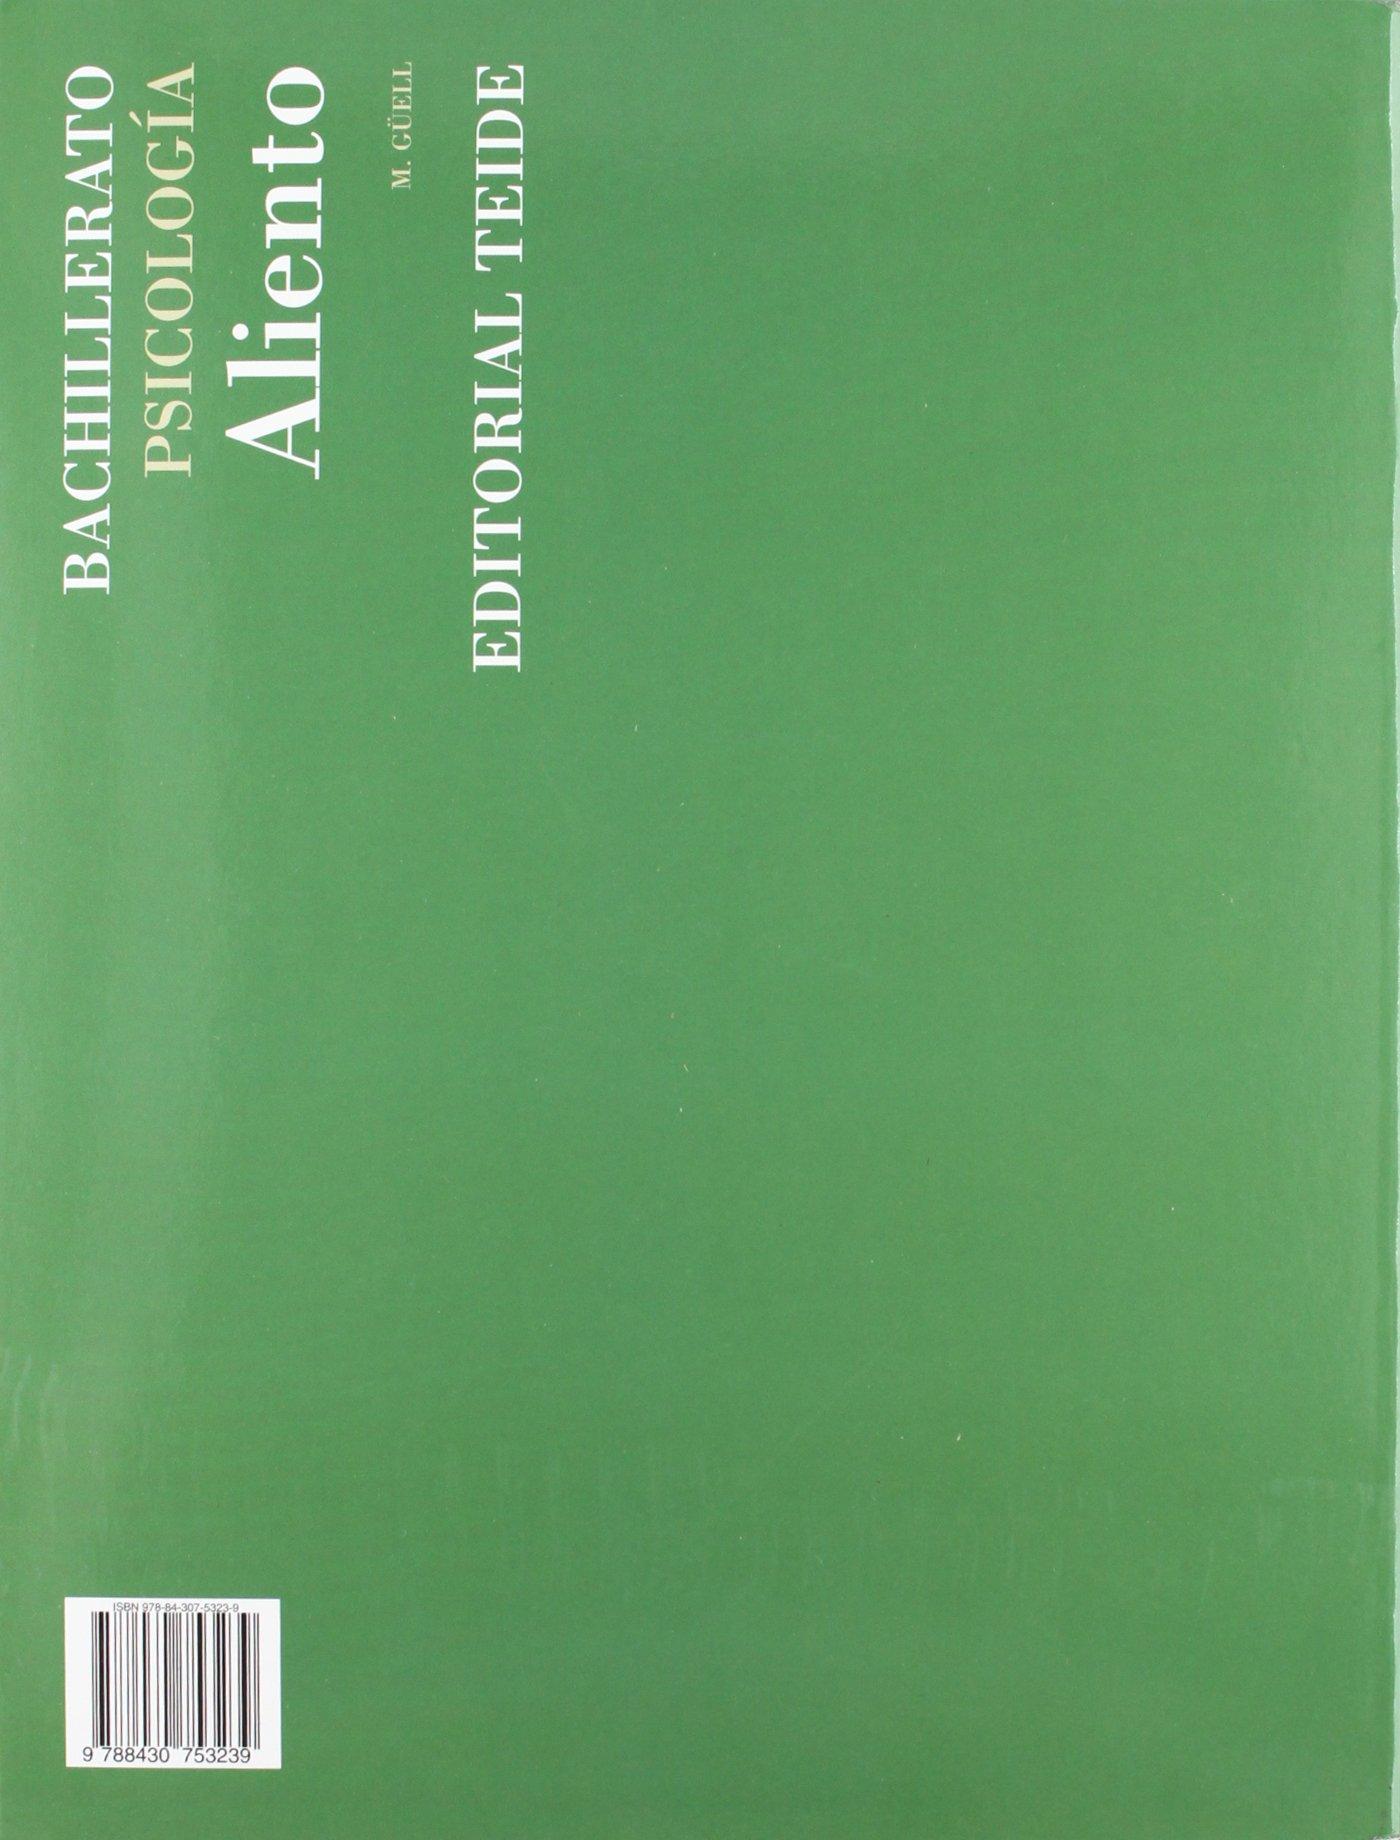 Aliento. Psicología. Bachillerato - ed. 2010 - 9788430753239: Amazon.es: Güell Barceló, Manel: Libros